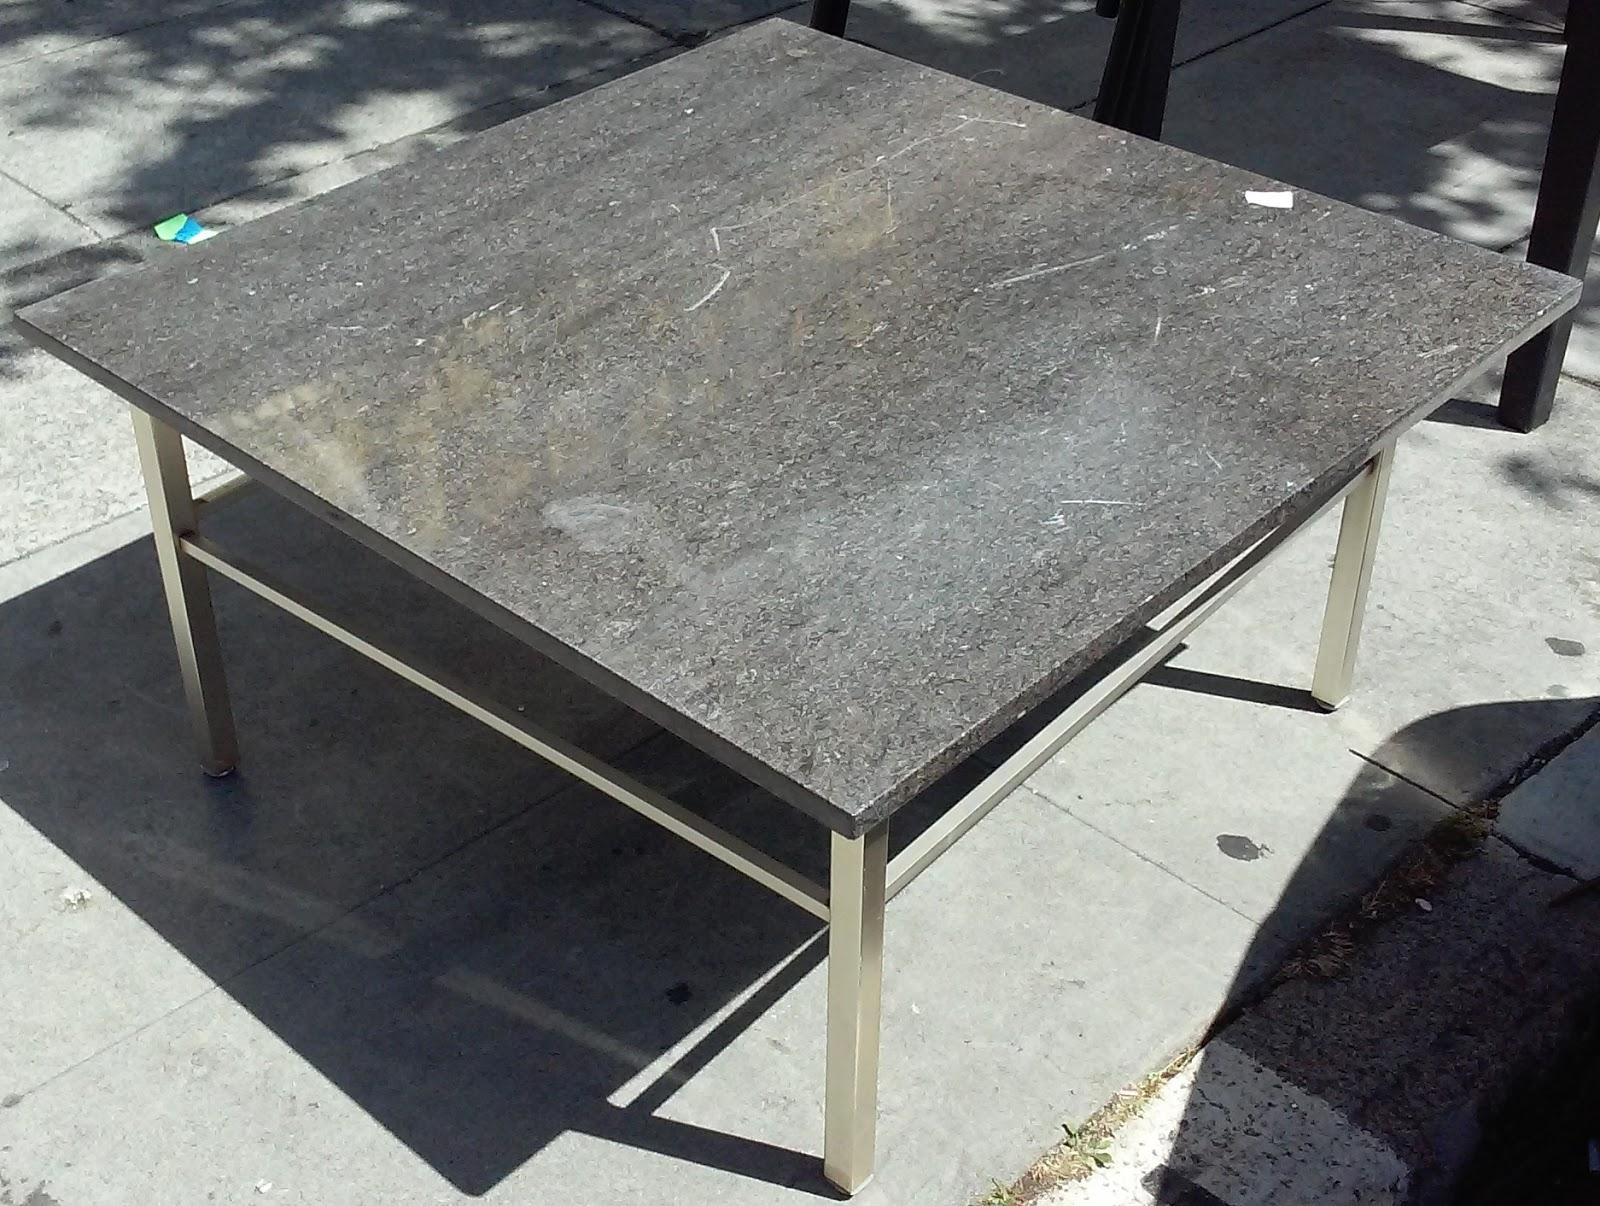 Uhuru Furniture Collectibles Sold Bargain Buy 2745 3 39 Square Granite Top Coffee Table 30